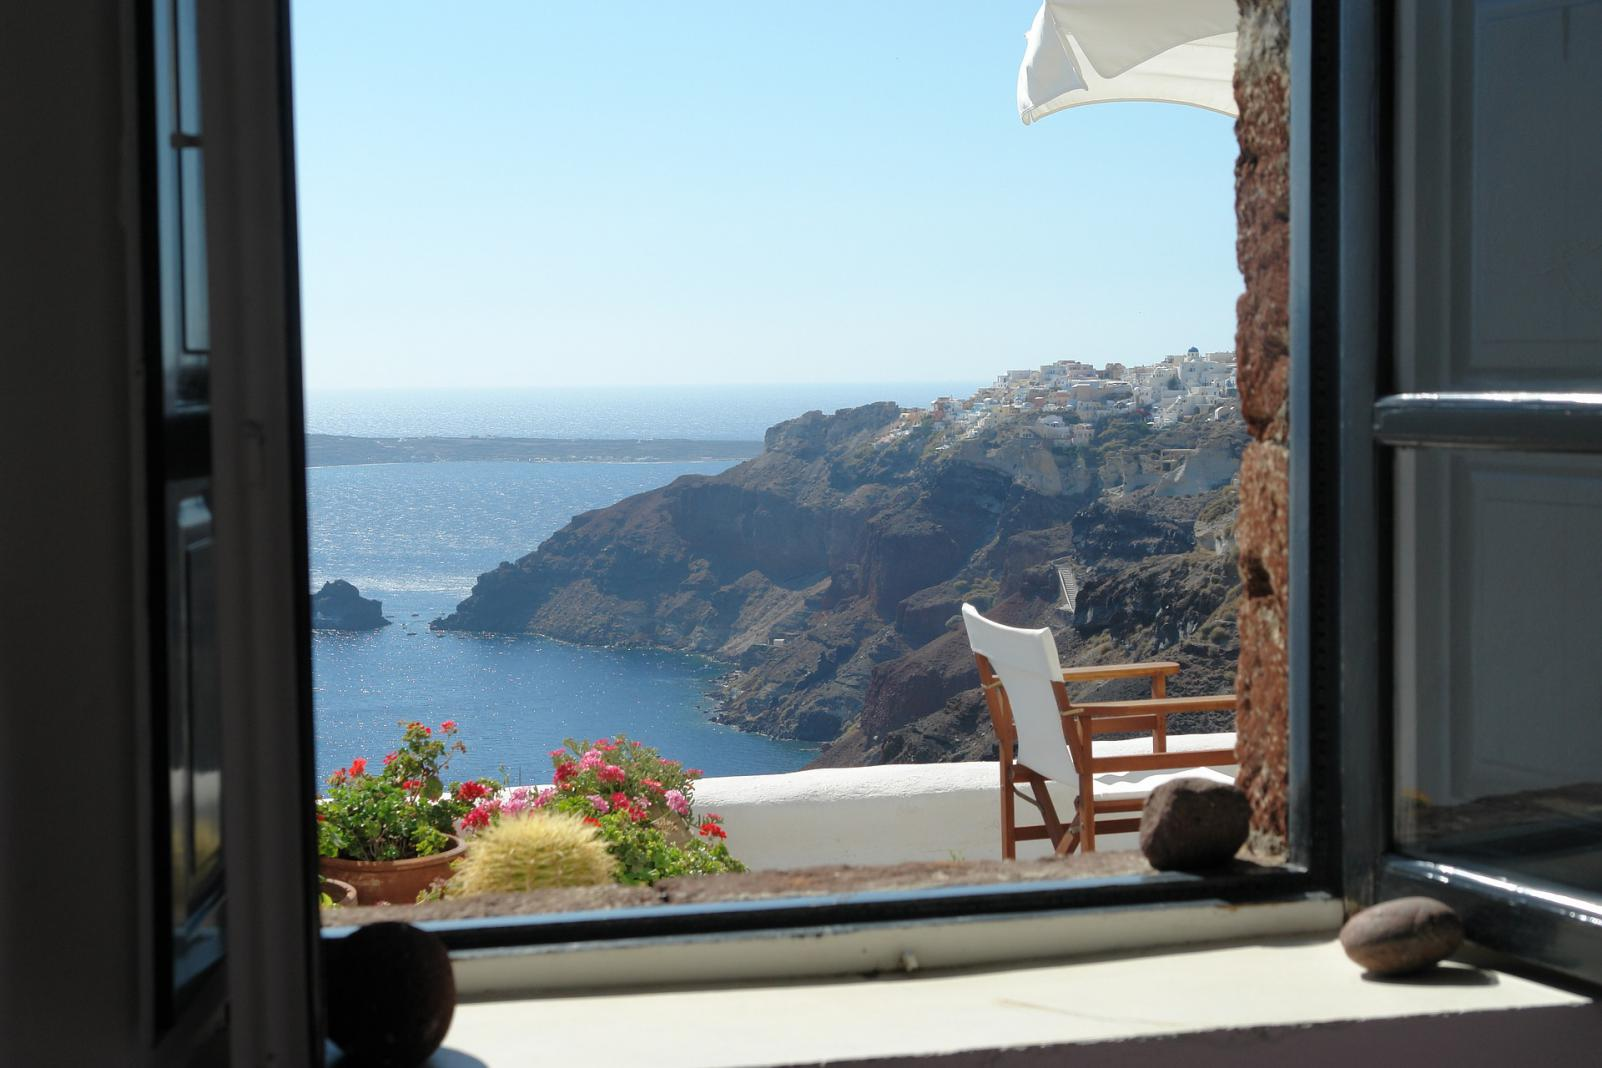 Santorini caldera view through room window KidsLoveGreece